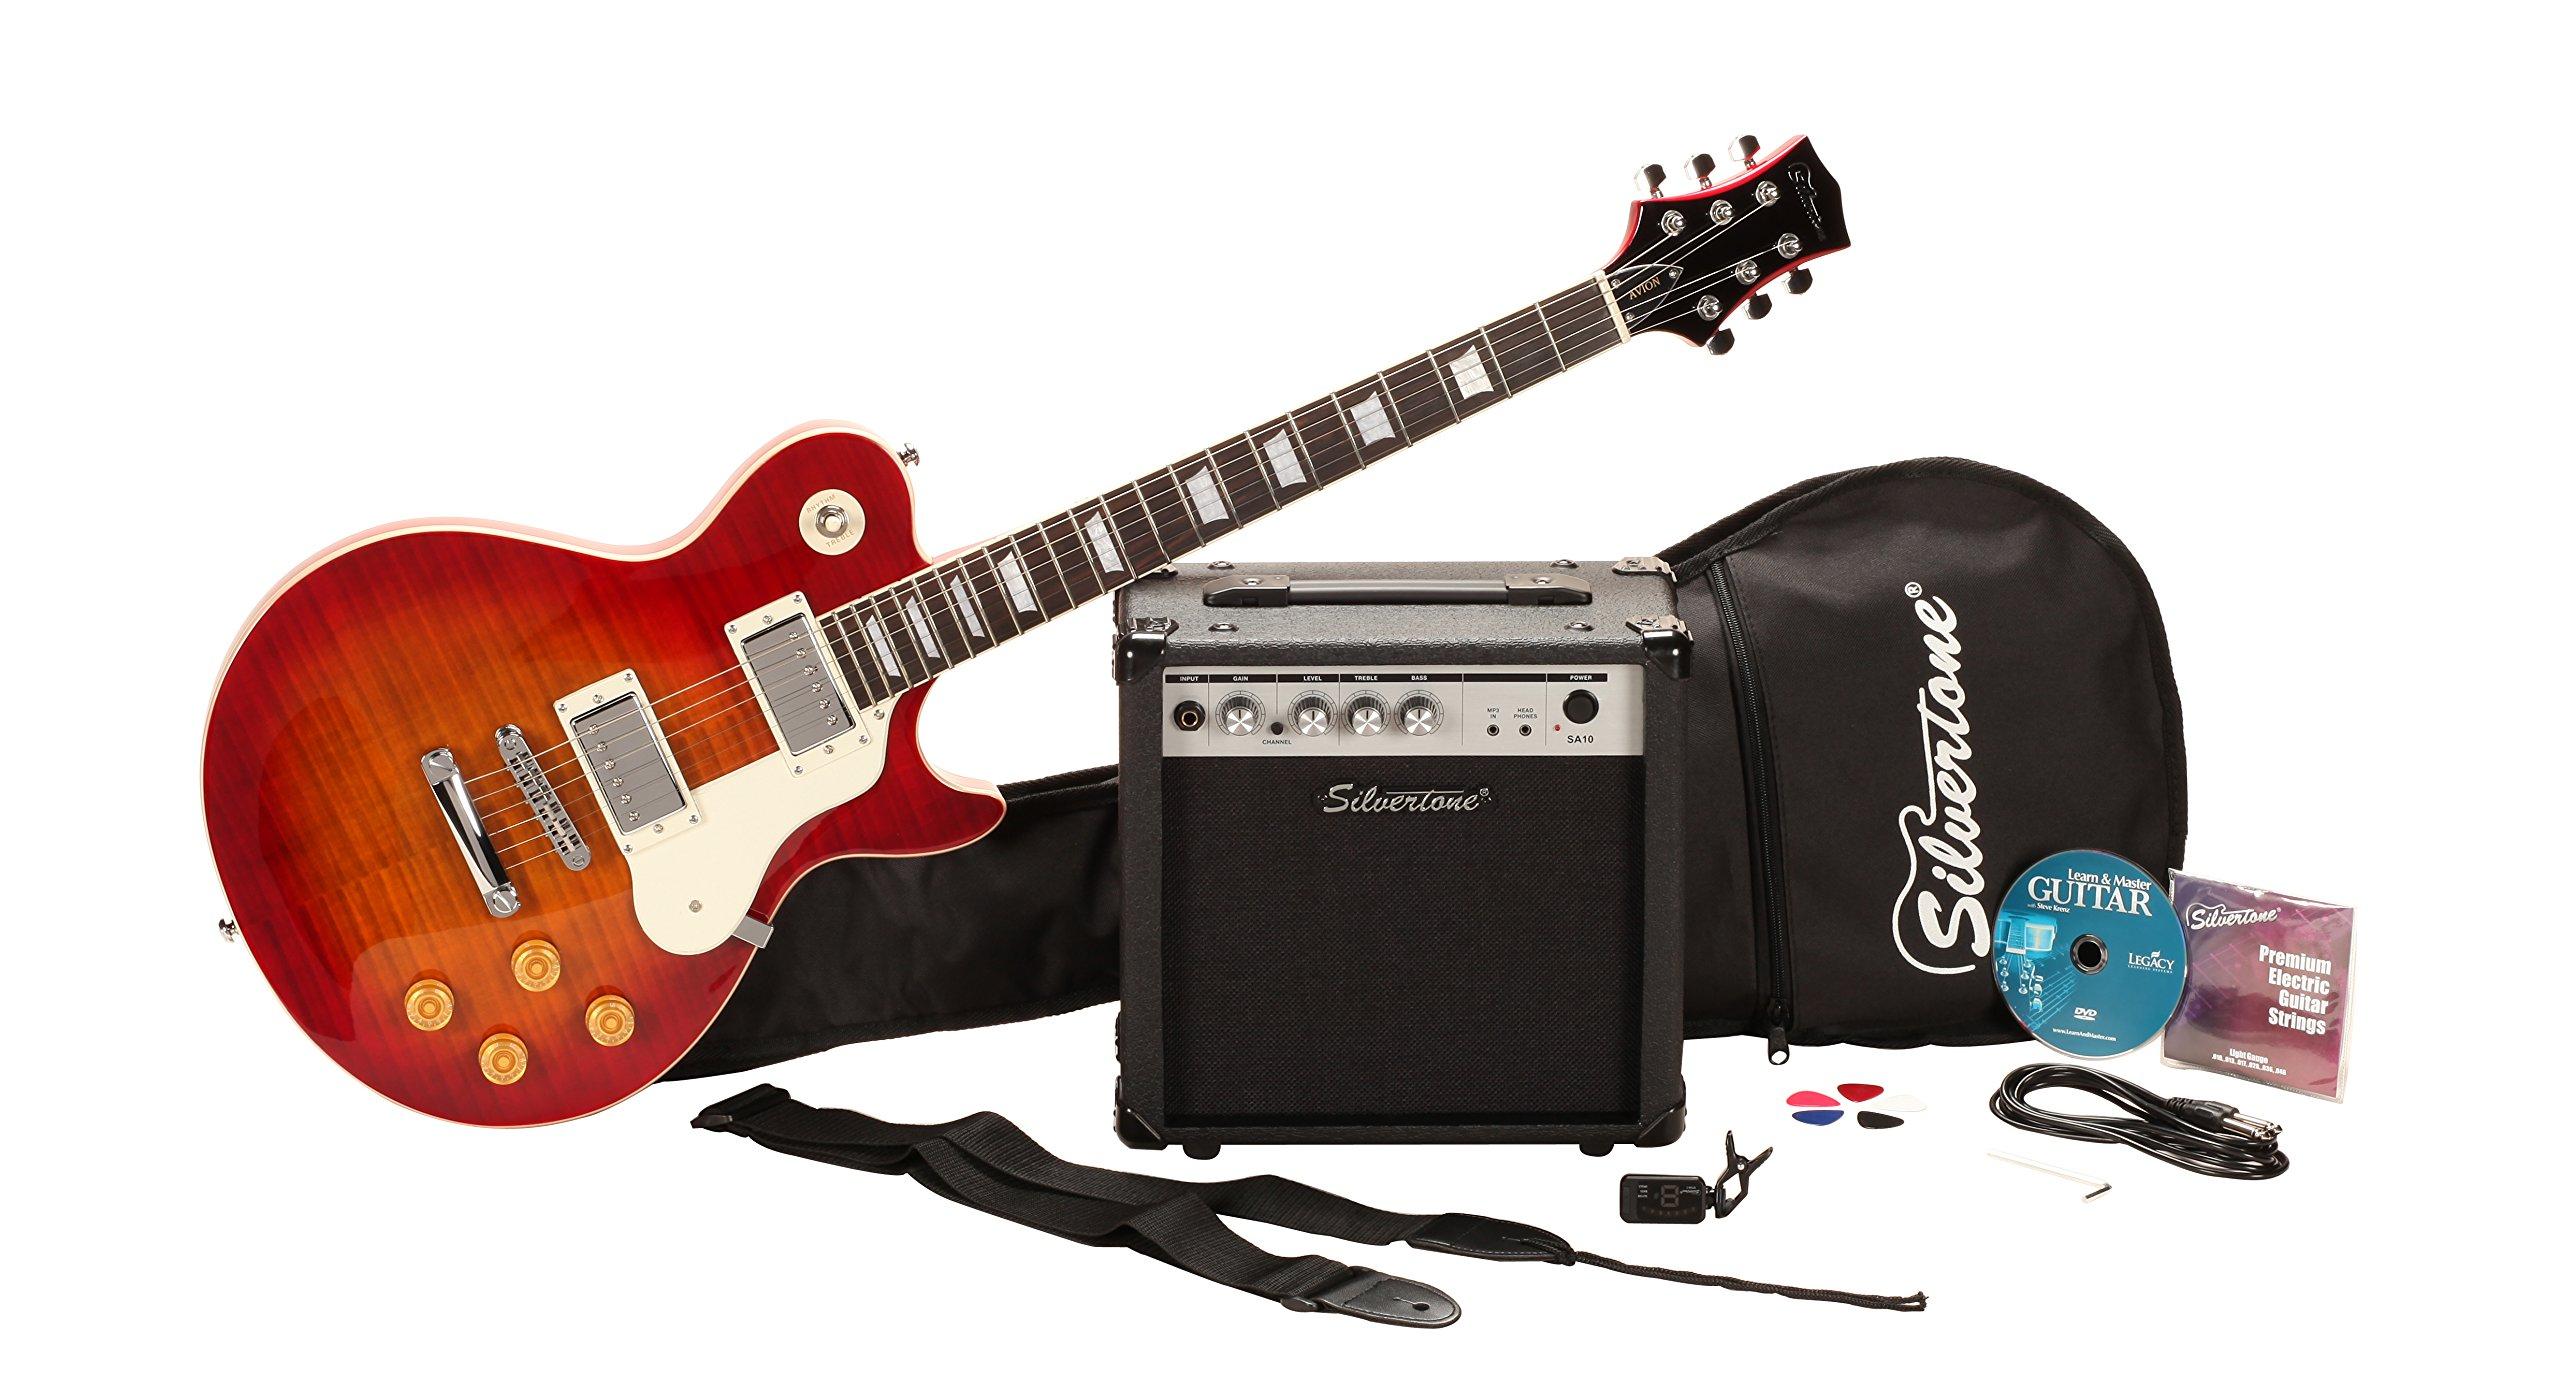 Silvertone SSL3 Electric Guitar Package, Vintage Cherry Sunburst